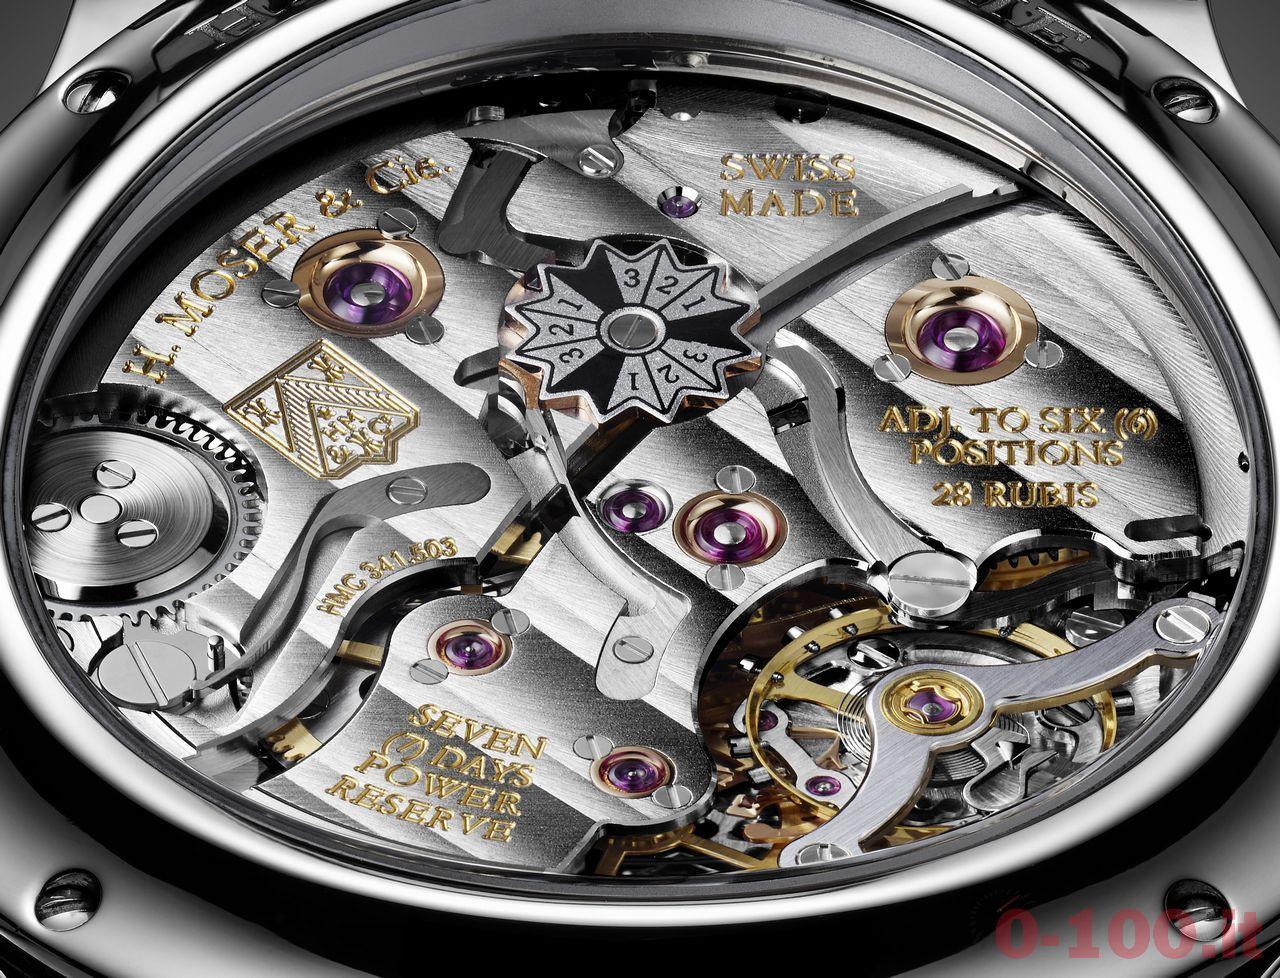 anteprima-baselworld-2015-h-moser-cie-endeavour-perpetual-calendar-funky-blue-ref-1341-0207-prezzo-price_0-100_6